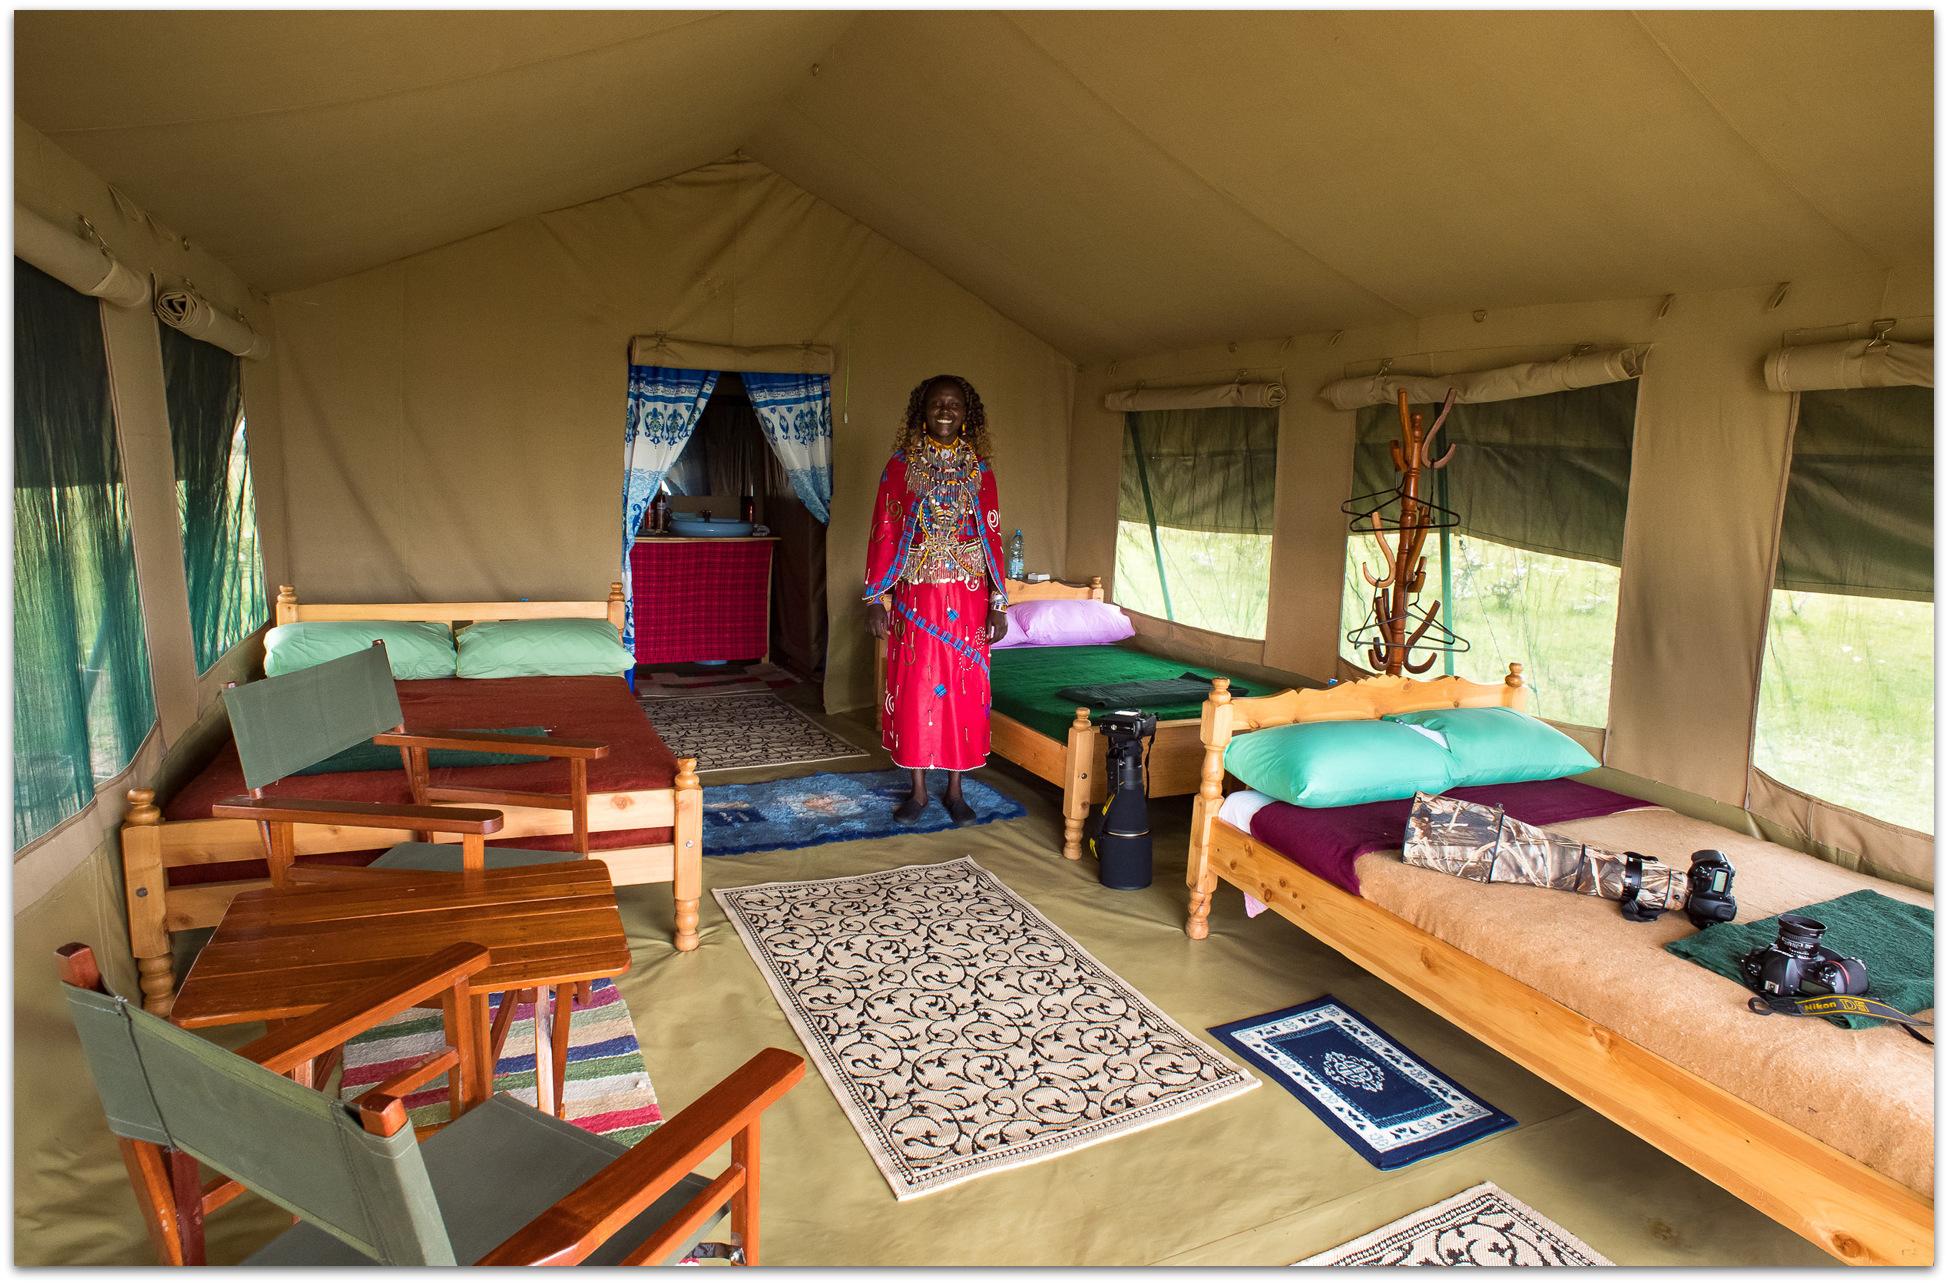 Inside a tent in the Maasai Mara with Maasai woman